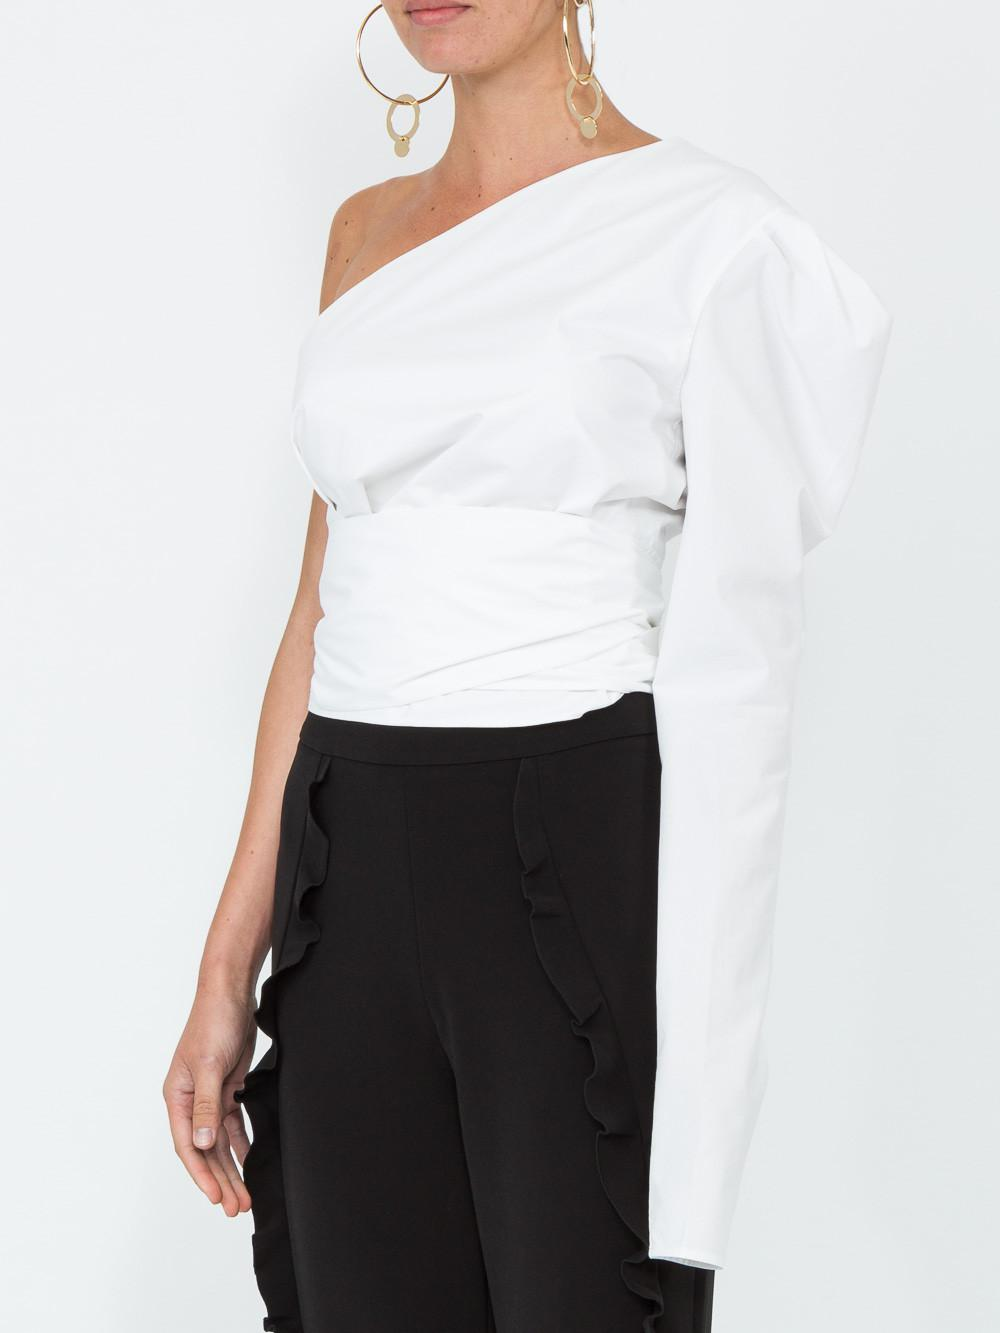 Sale For Sale One-Shoulder Silk Blouse Alexandre Vauthier Best Place For Sale Hot Sale Cheap Price OLqIioi